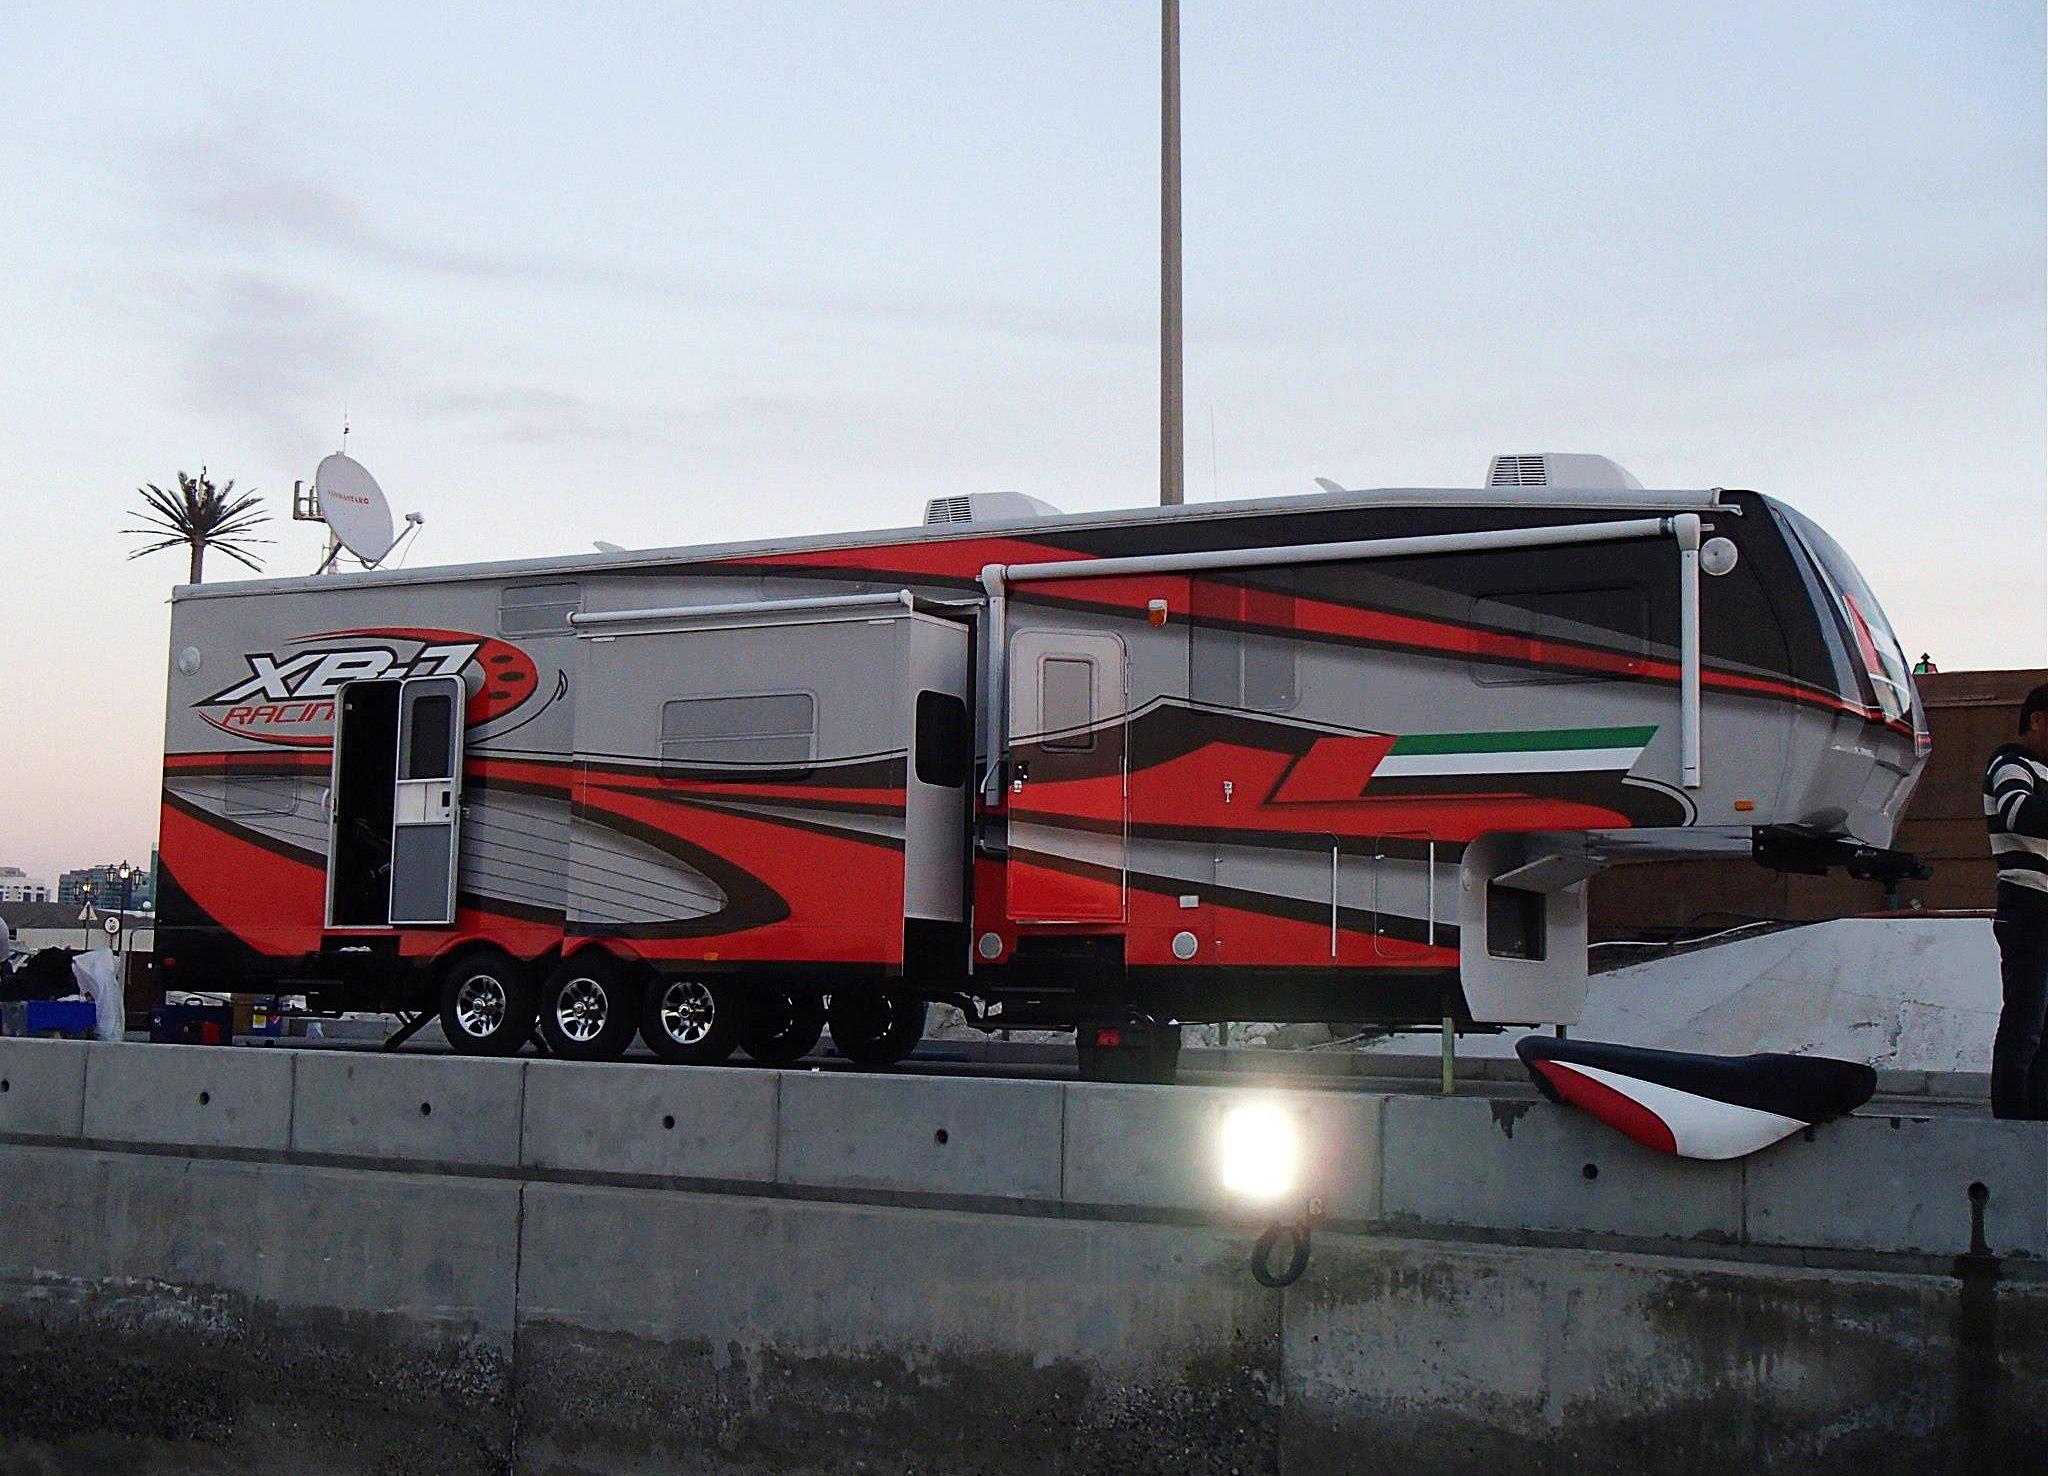 93369a6efe Custom Trailer Wrap Design (50% Deposit) – IPD Jet Ski Graphics